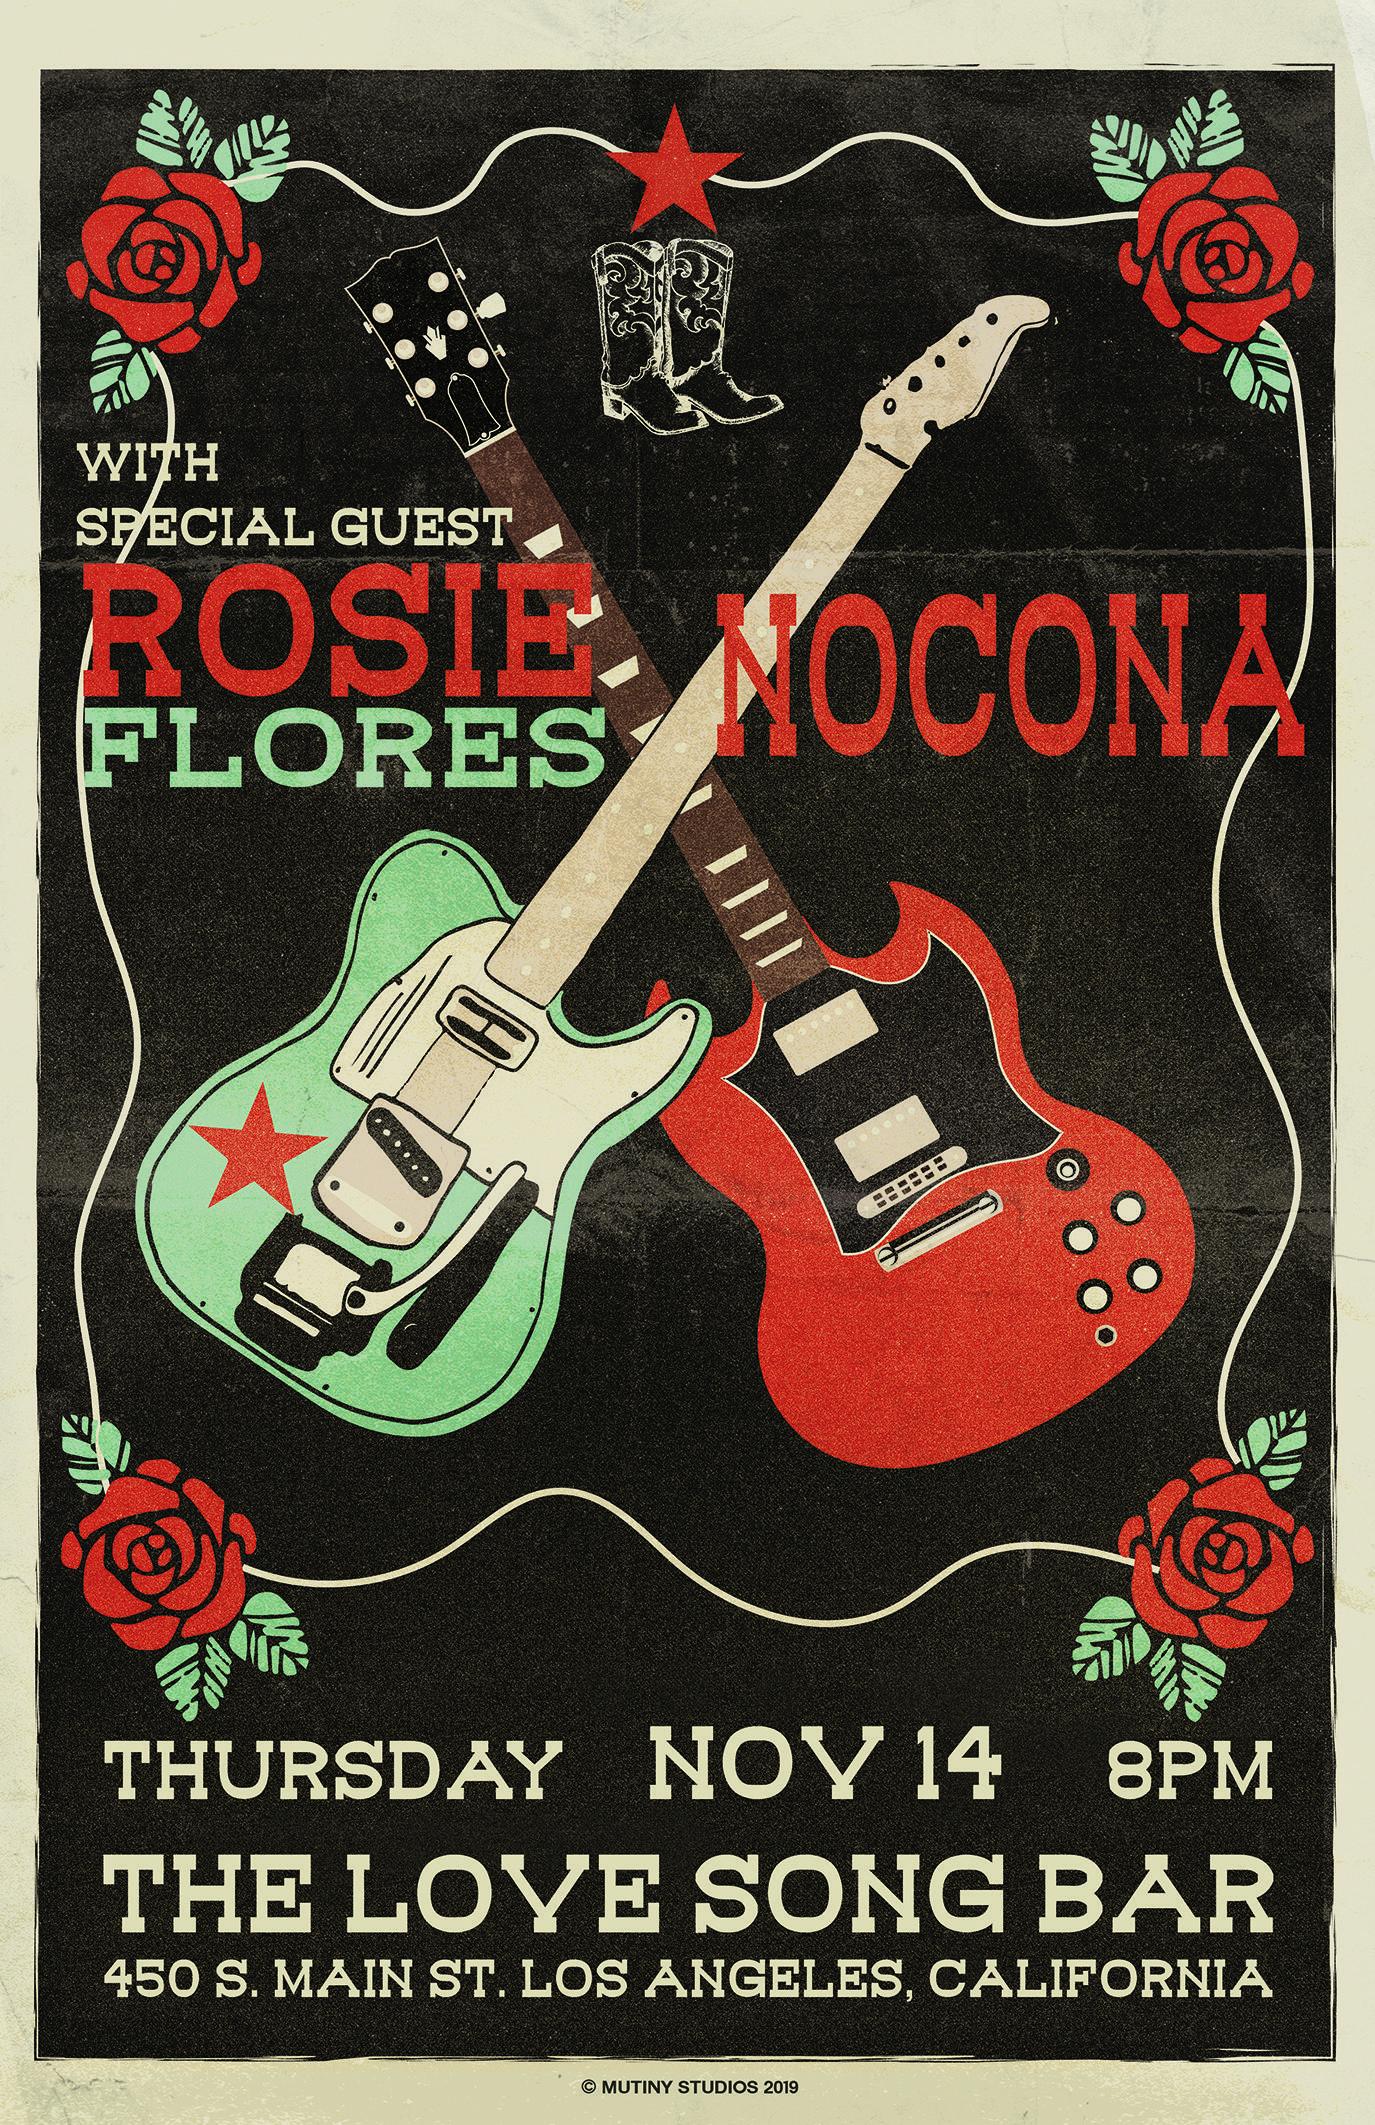 NOCONA with special guest Rosie Flores